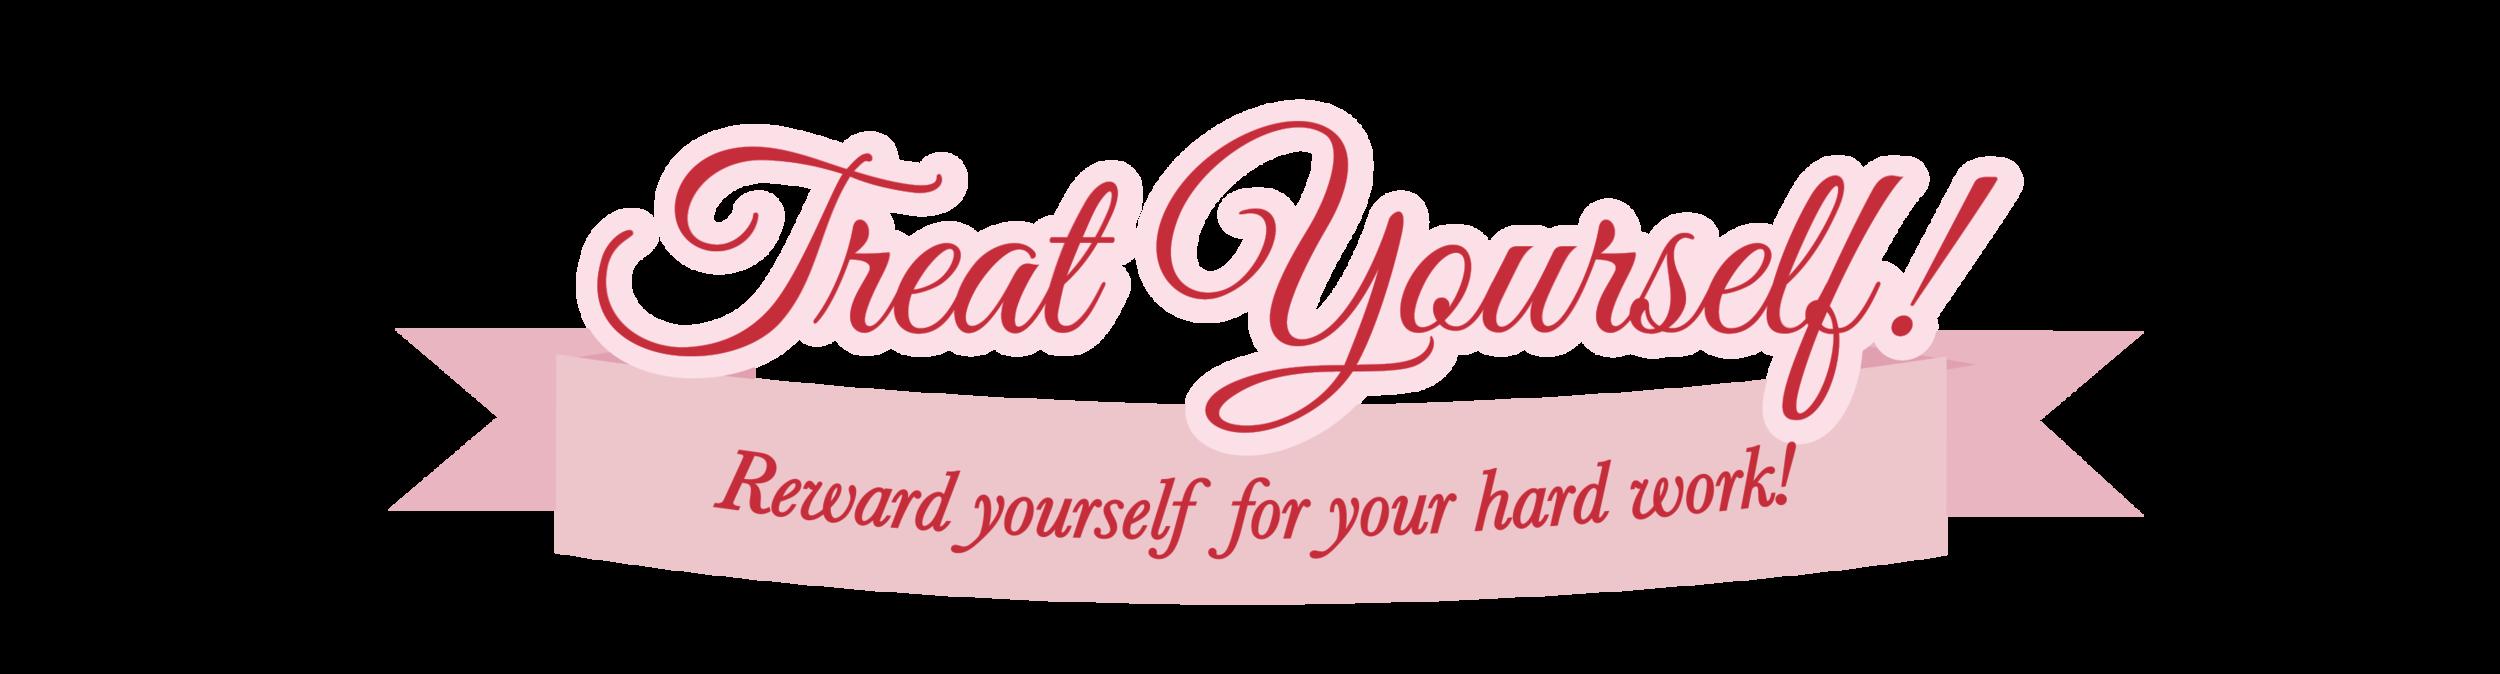 TreatYourself-banner.png